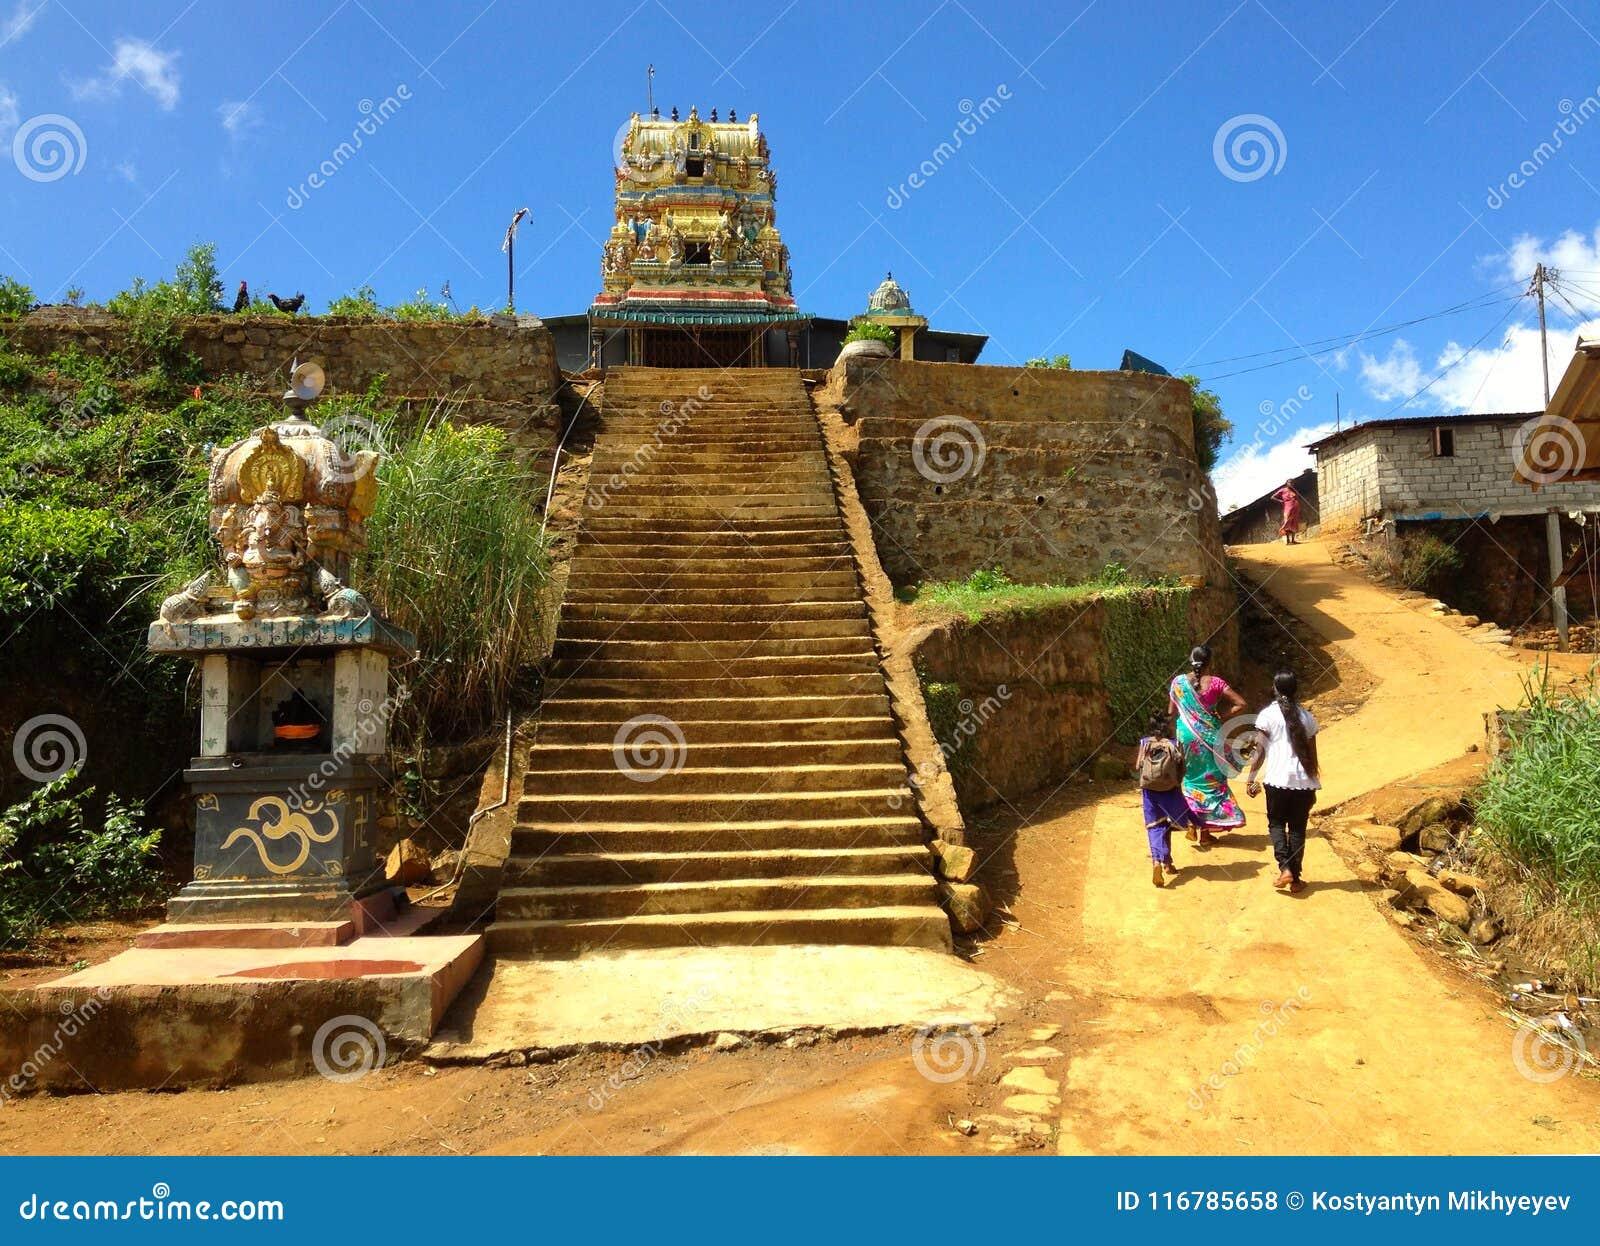 Висок в деревне Nanuoya